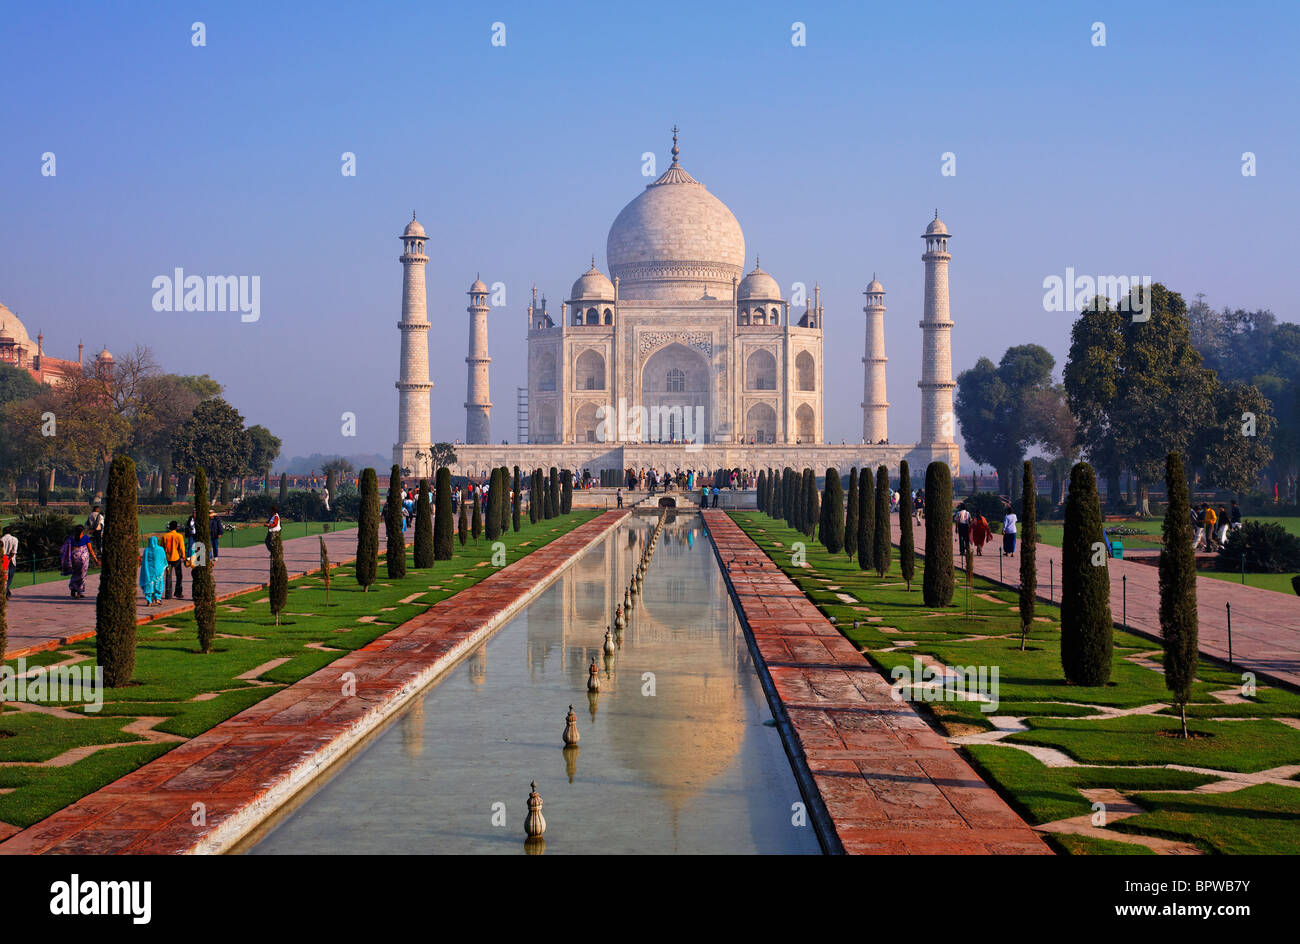 The Taj Mahal, Agra, Uttar Pradesh, India - Stock Image